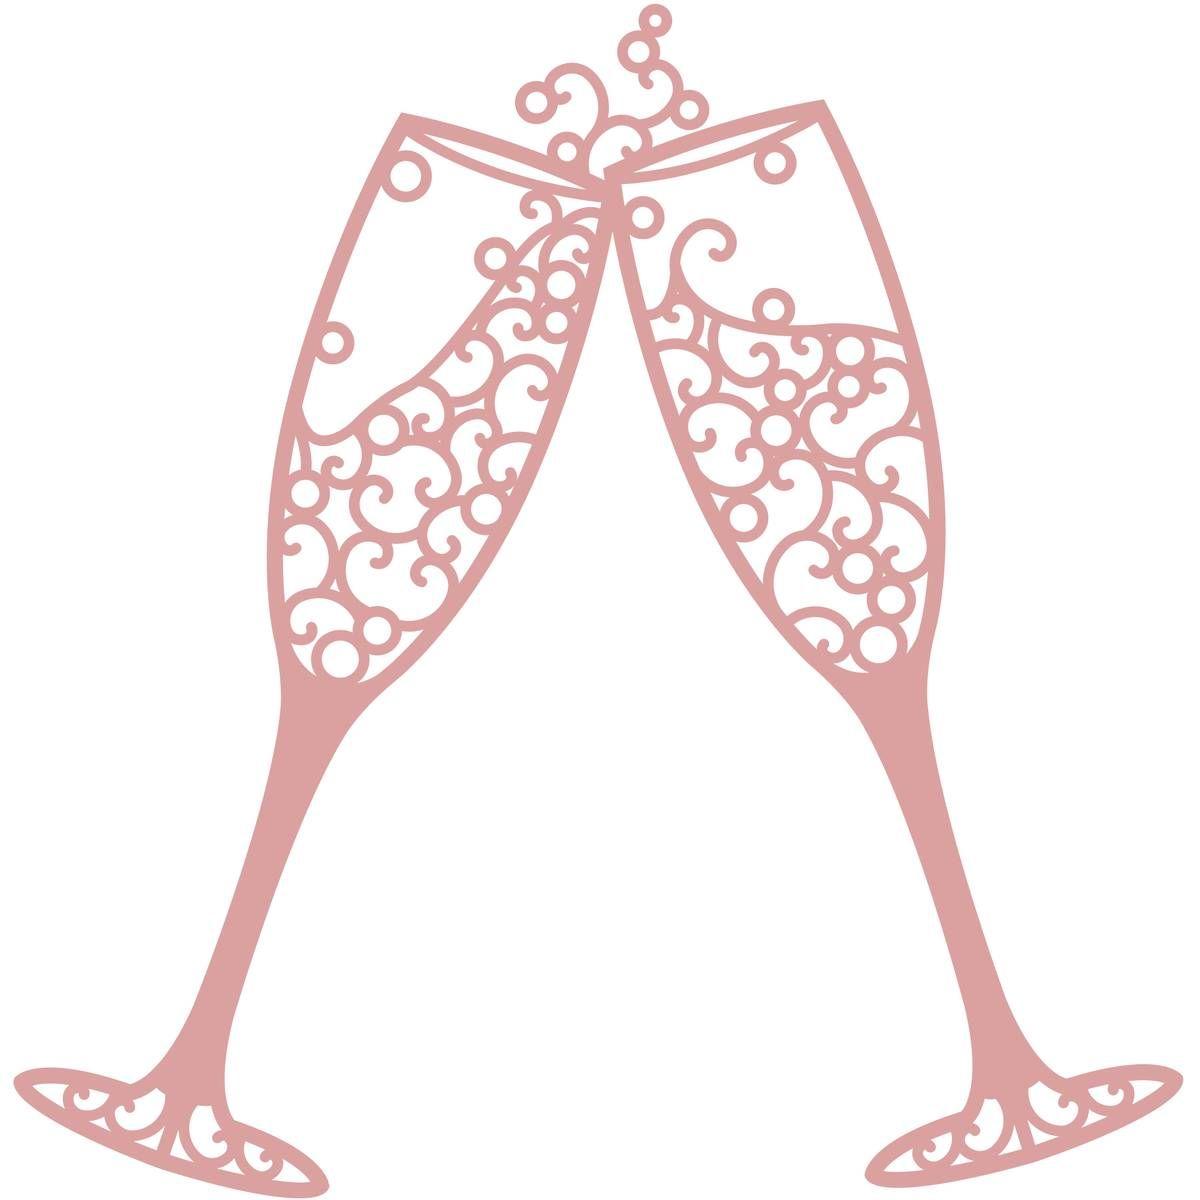 Intricut Champagne Glasses Die 11.1cm x 10.9cm.